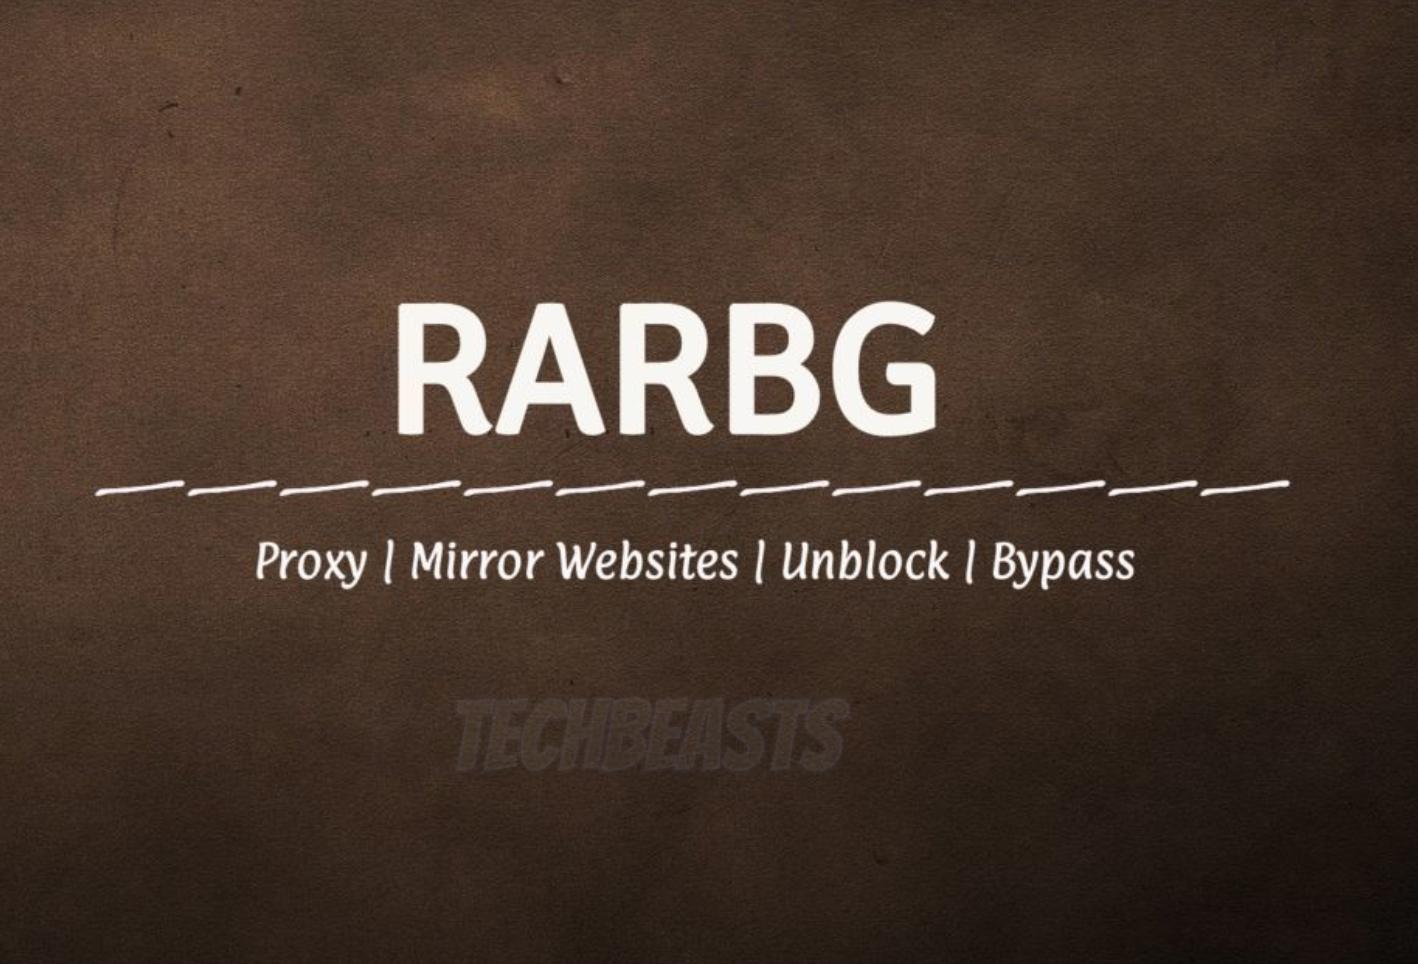 RARBG unblock